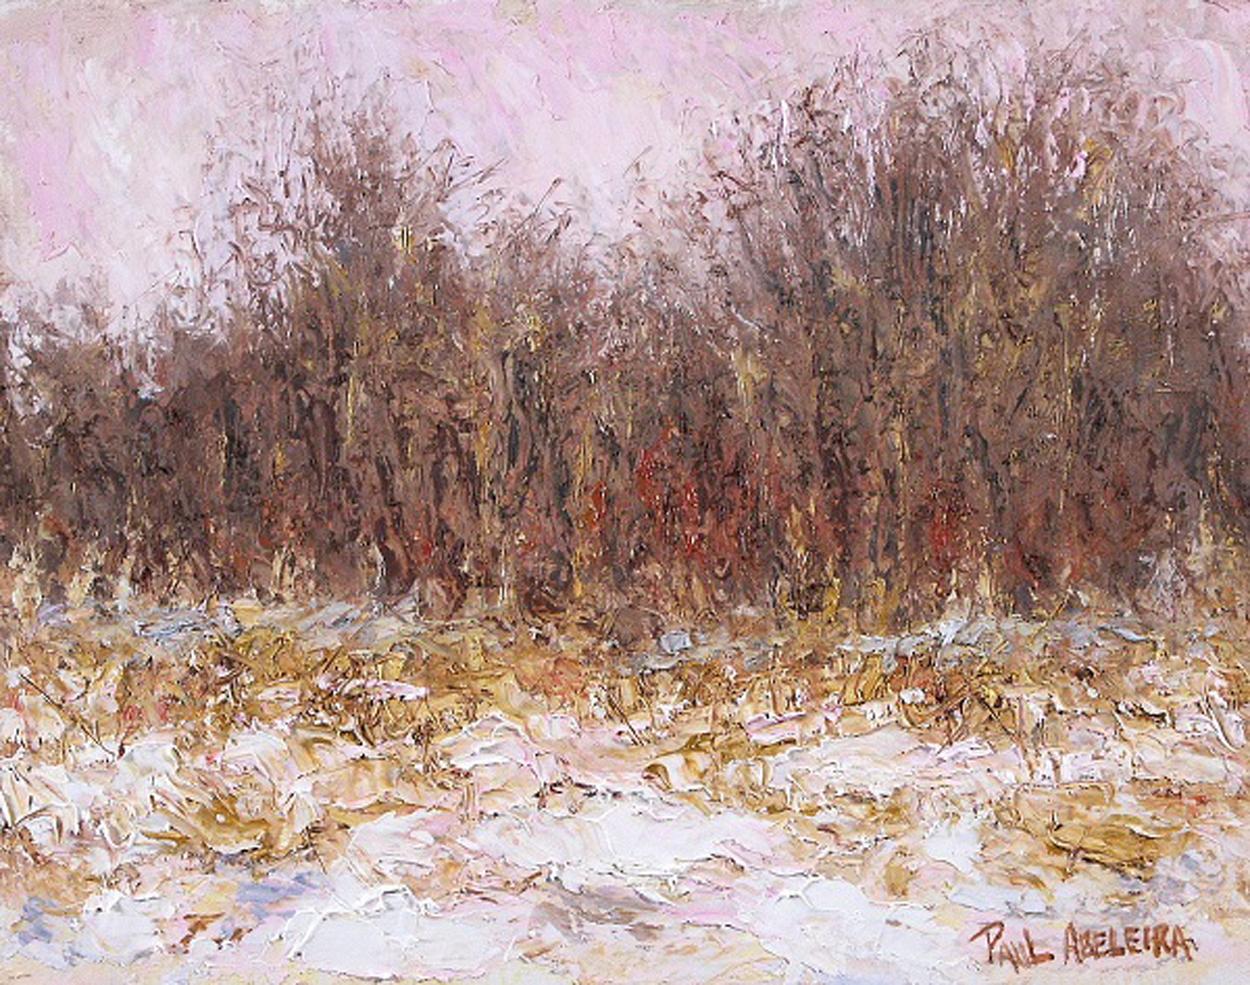 """Ravine in January"" by Paul Abeleira"